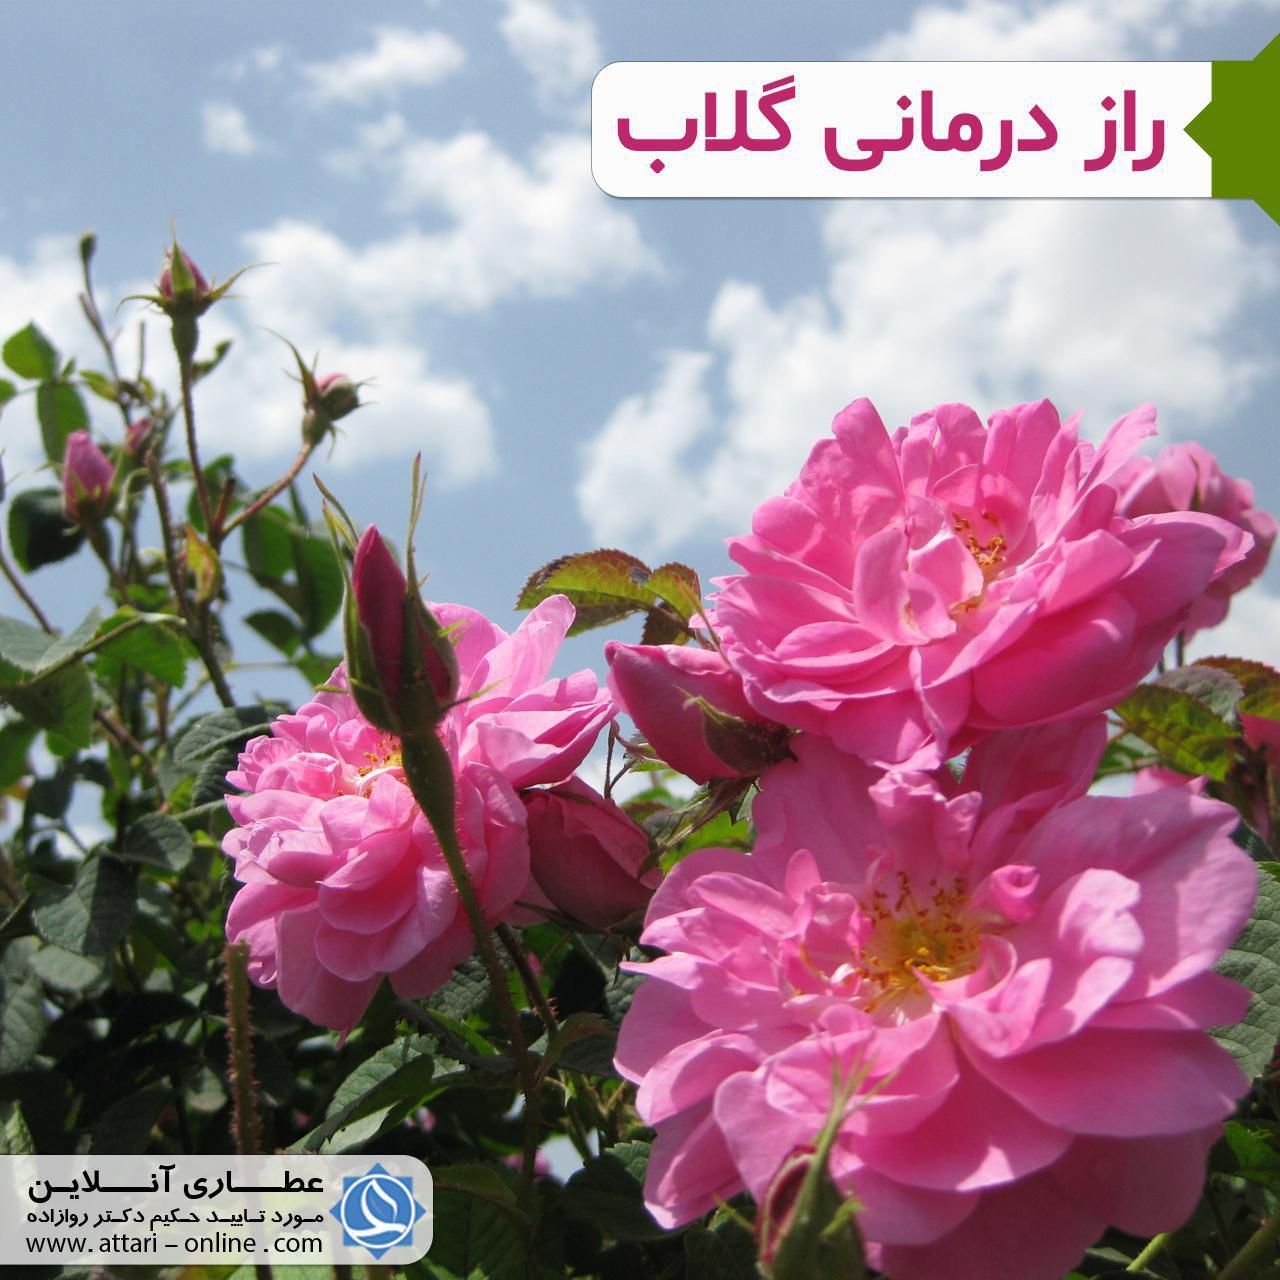 photo 2018 09 05 15 50 14 راز درمانی گلاب